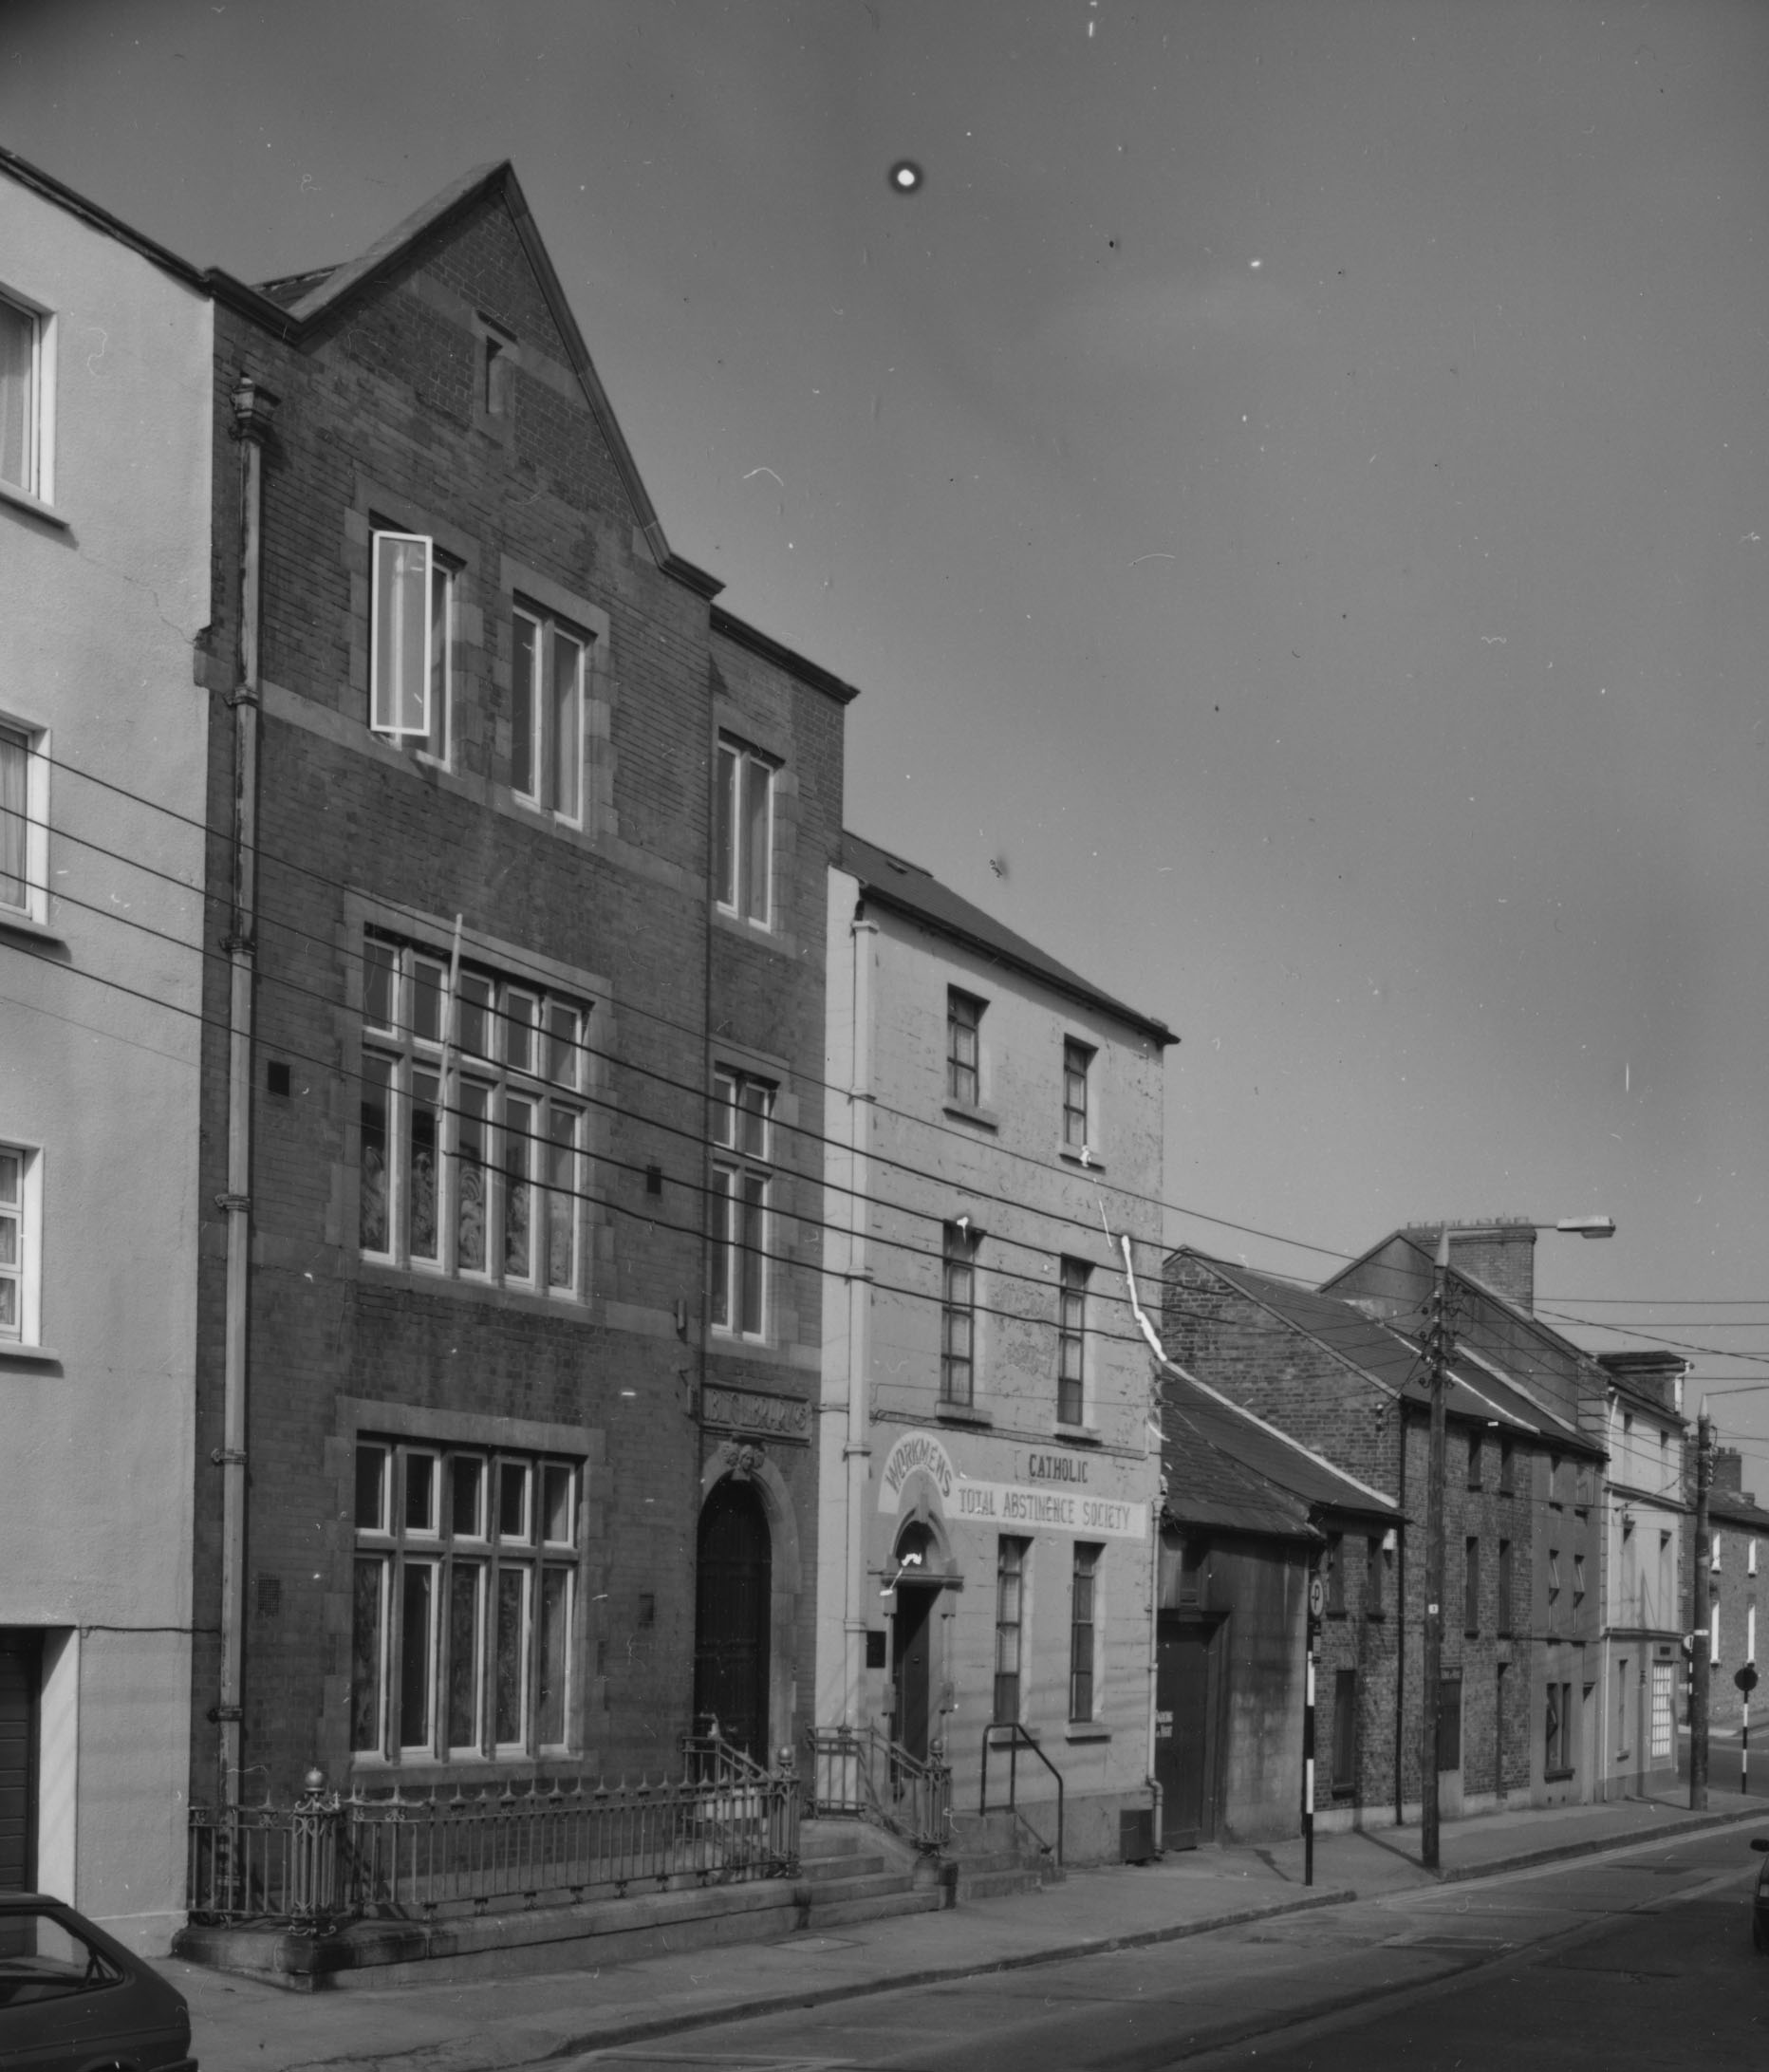 Carnegie Library, Drogheda (Photo: Brendan Grimes)